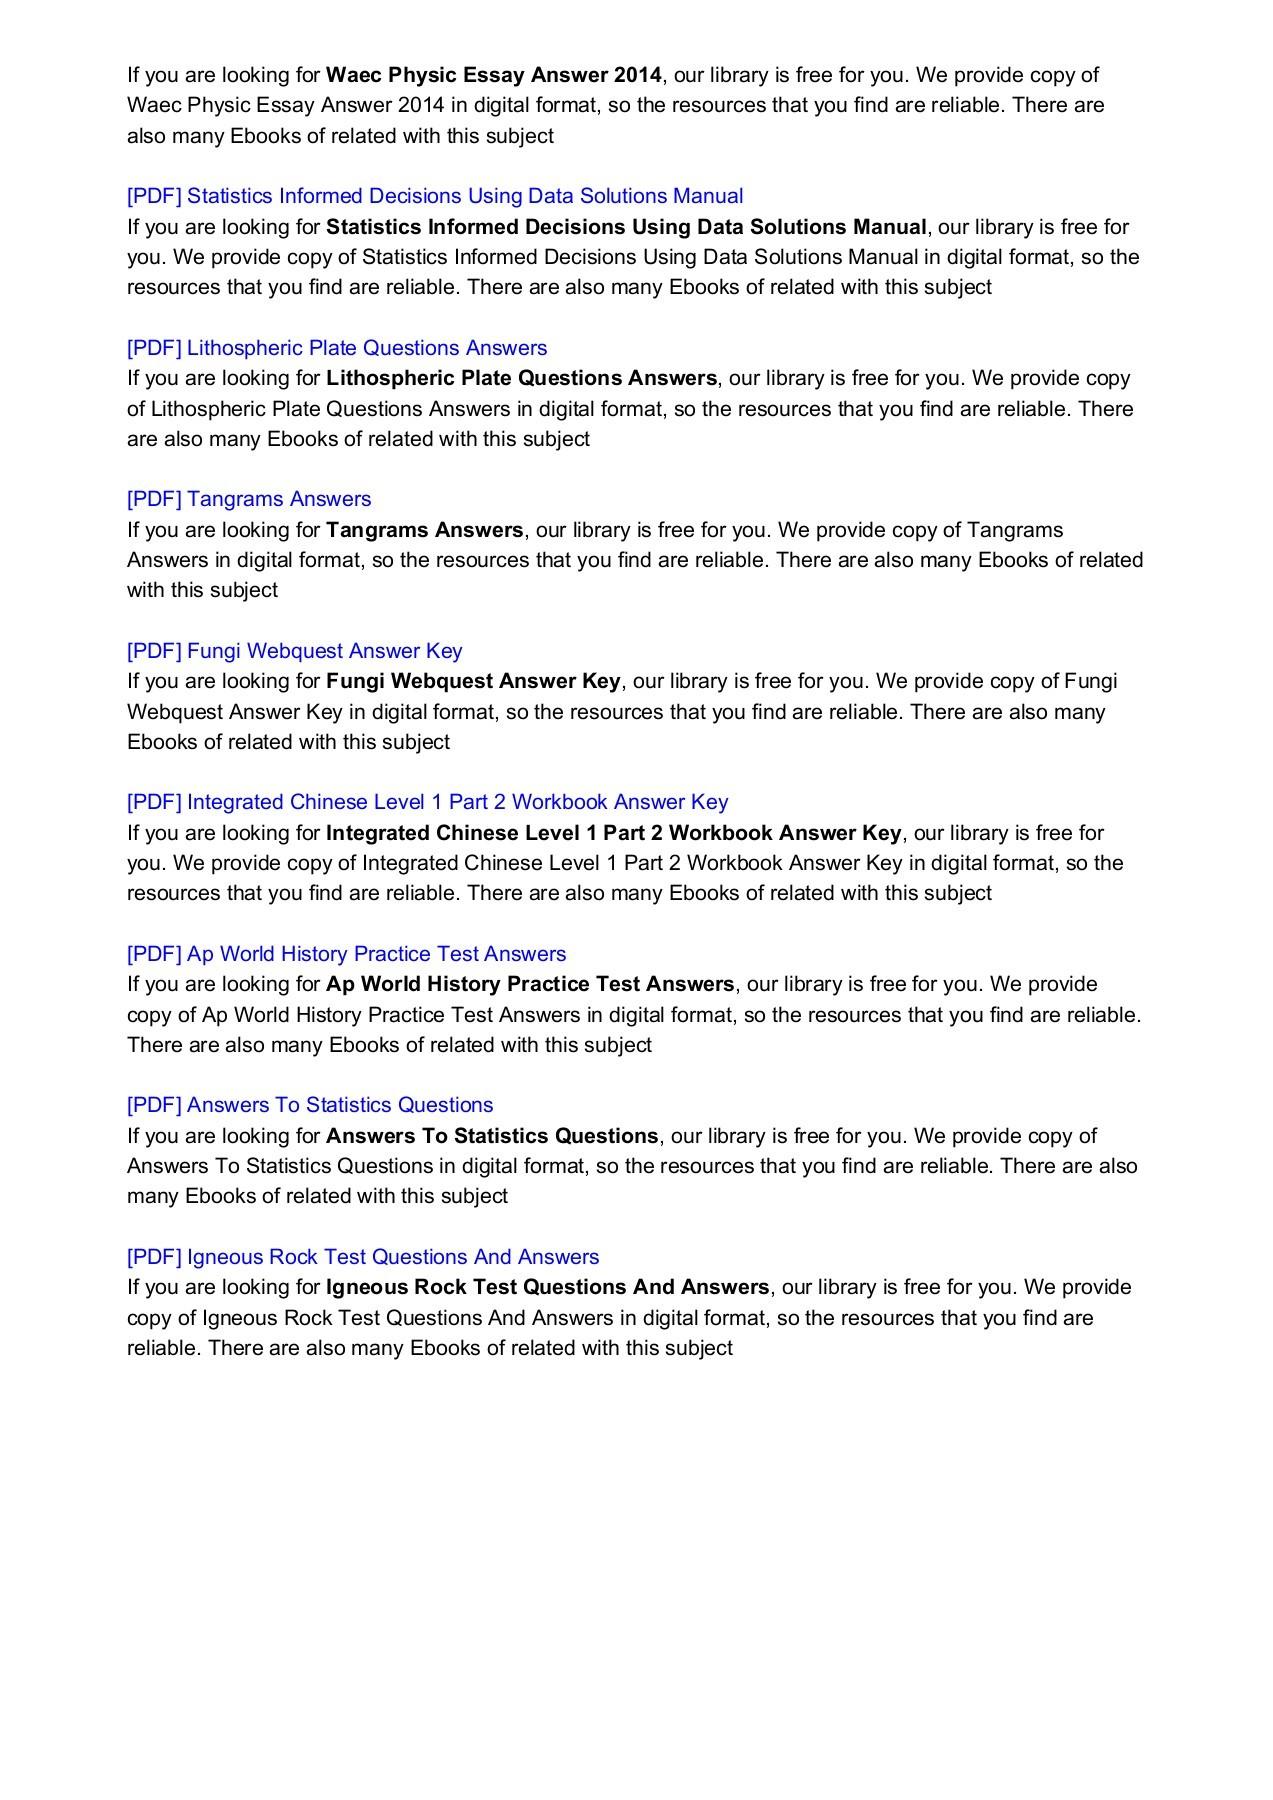 panasonic tda100 installation manual Array - tag heuer aquaracer manual  ebook rh tag heuer aquaracer manual ebook zettadata so